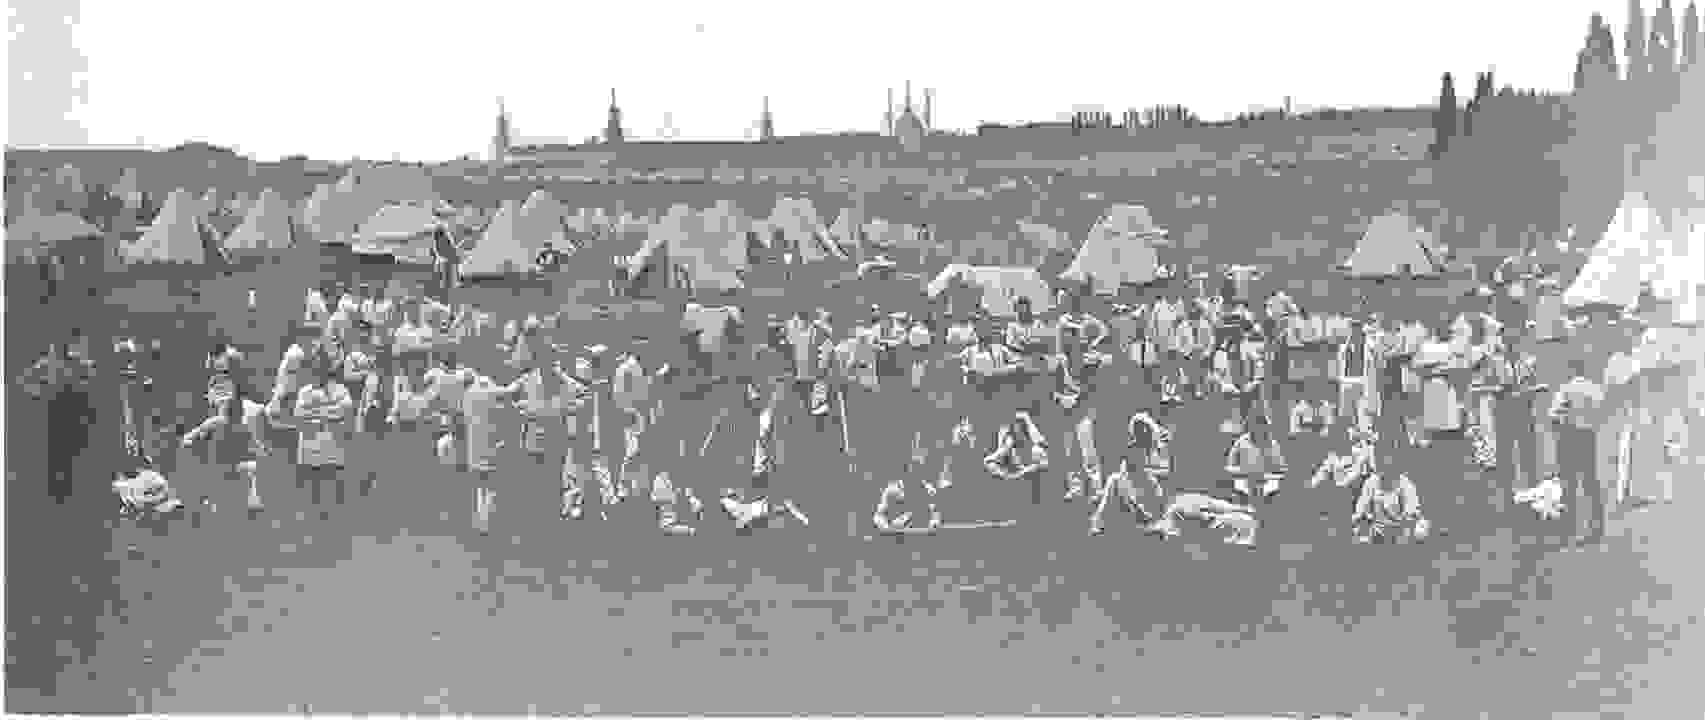 Grenadiersthumb.jpg (18929 bytes)